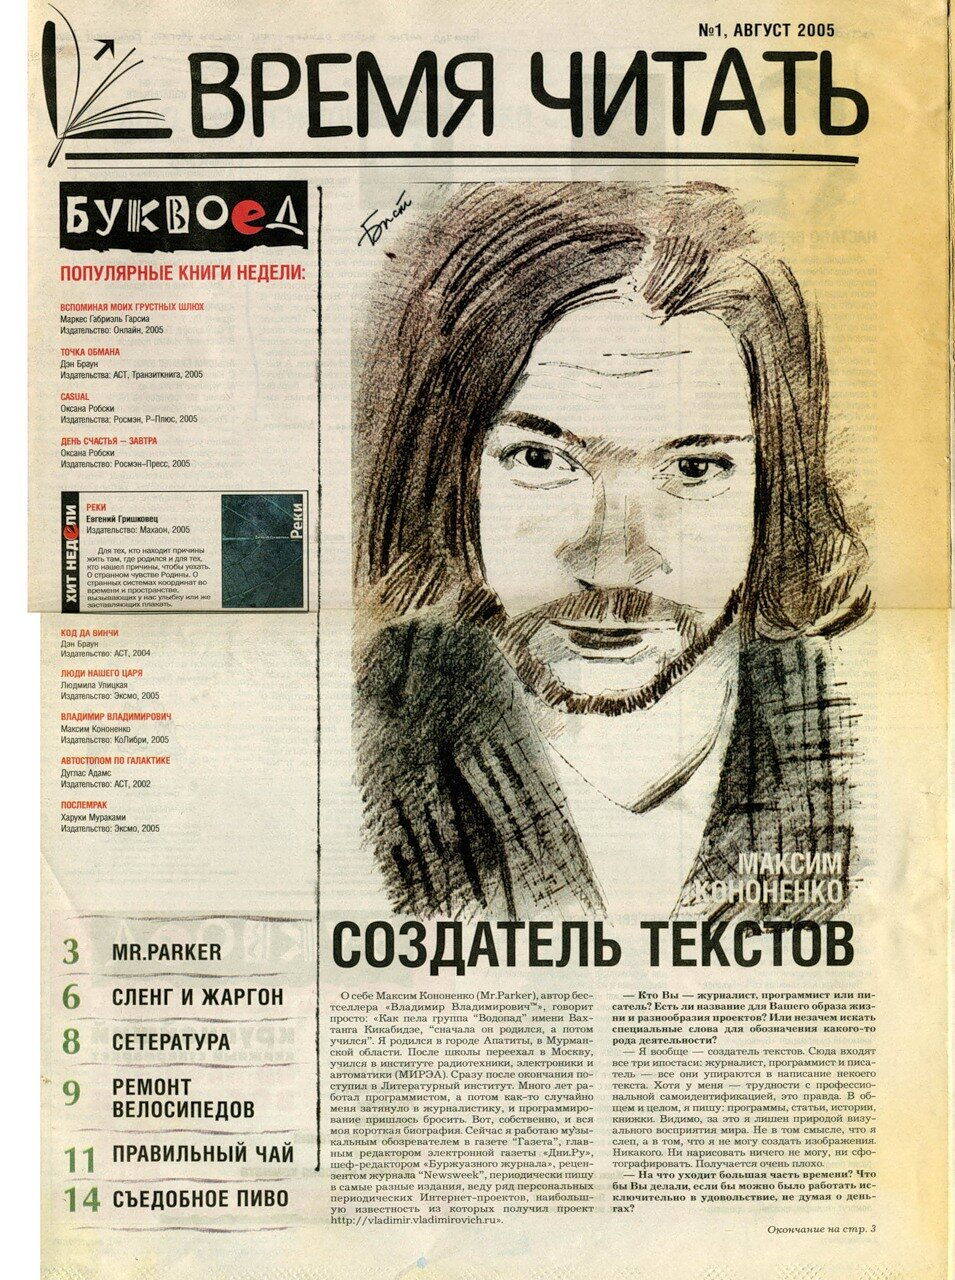 Kononenko Maxim (Mr. Parker). Portrait